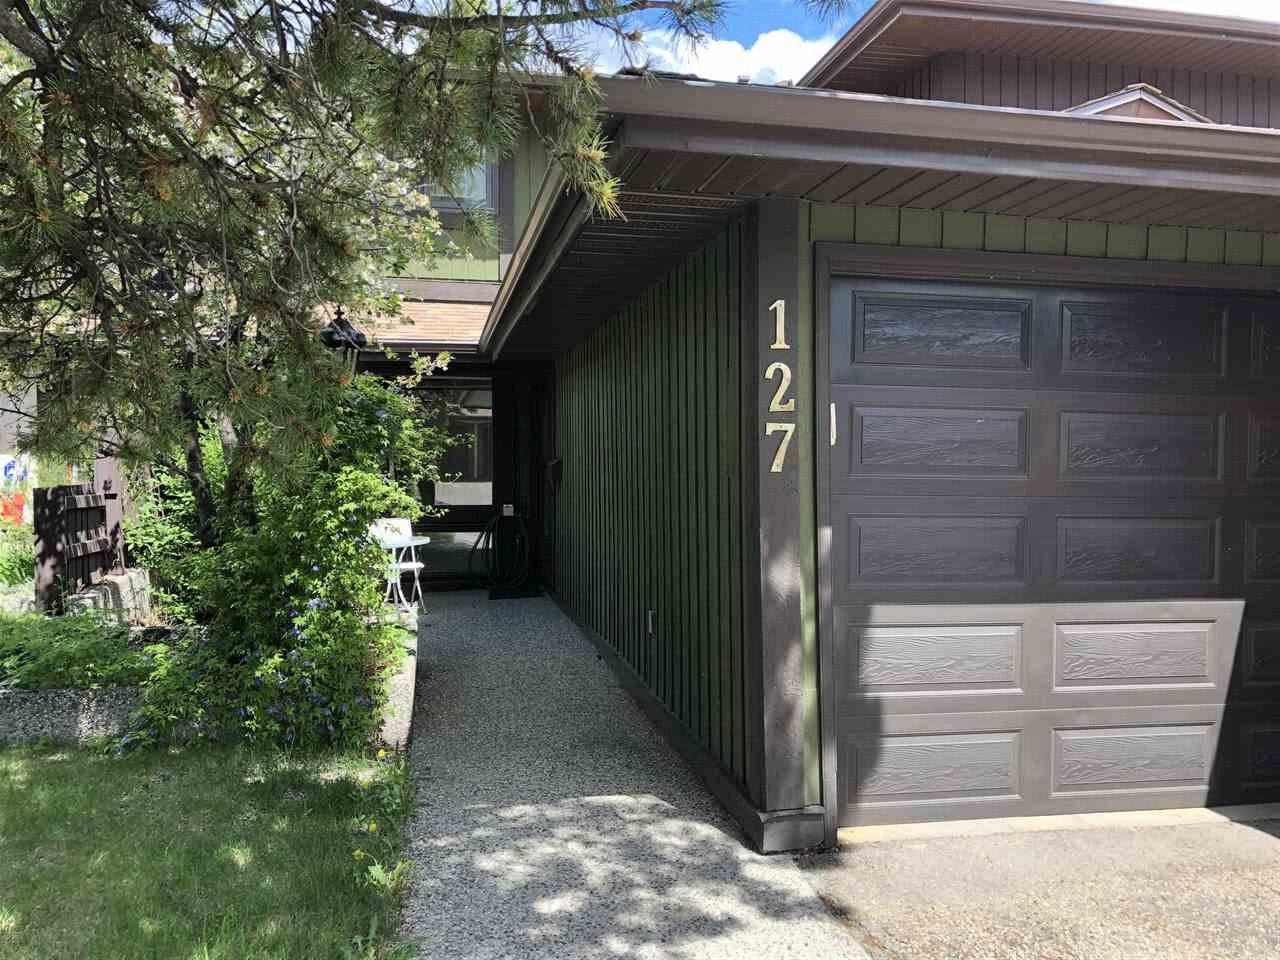 Main Photo: 127 HEARTHSTONE in Edmonton: Zone 14 Townhouse for sale : MLS®# E4200268